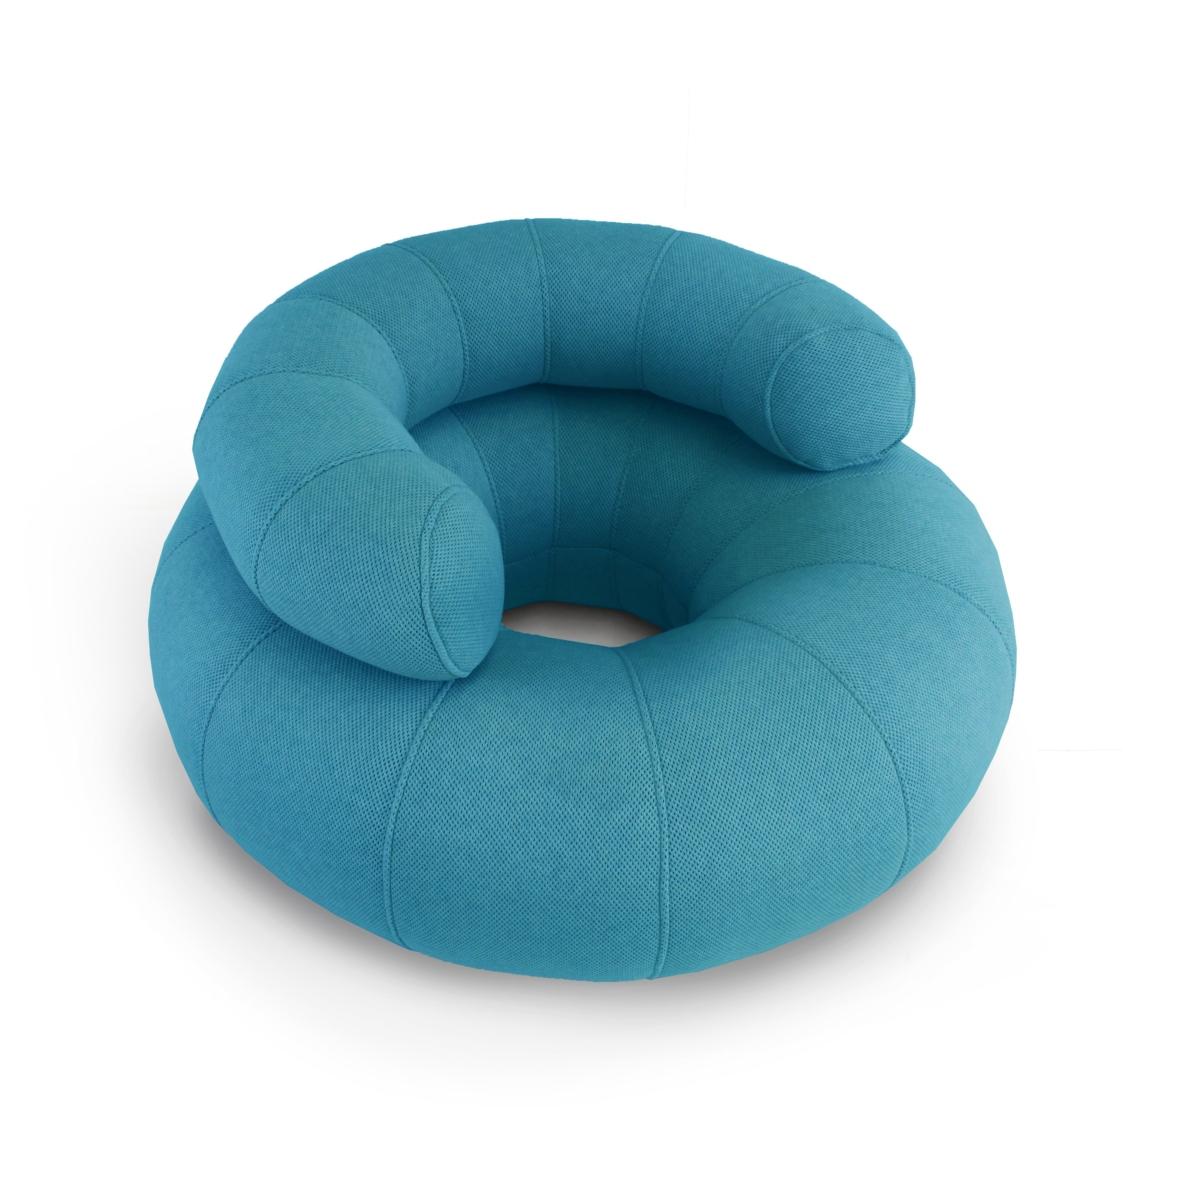 Foto de Don Out Sofa, colchoneta en Blue L. OGO